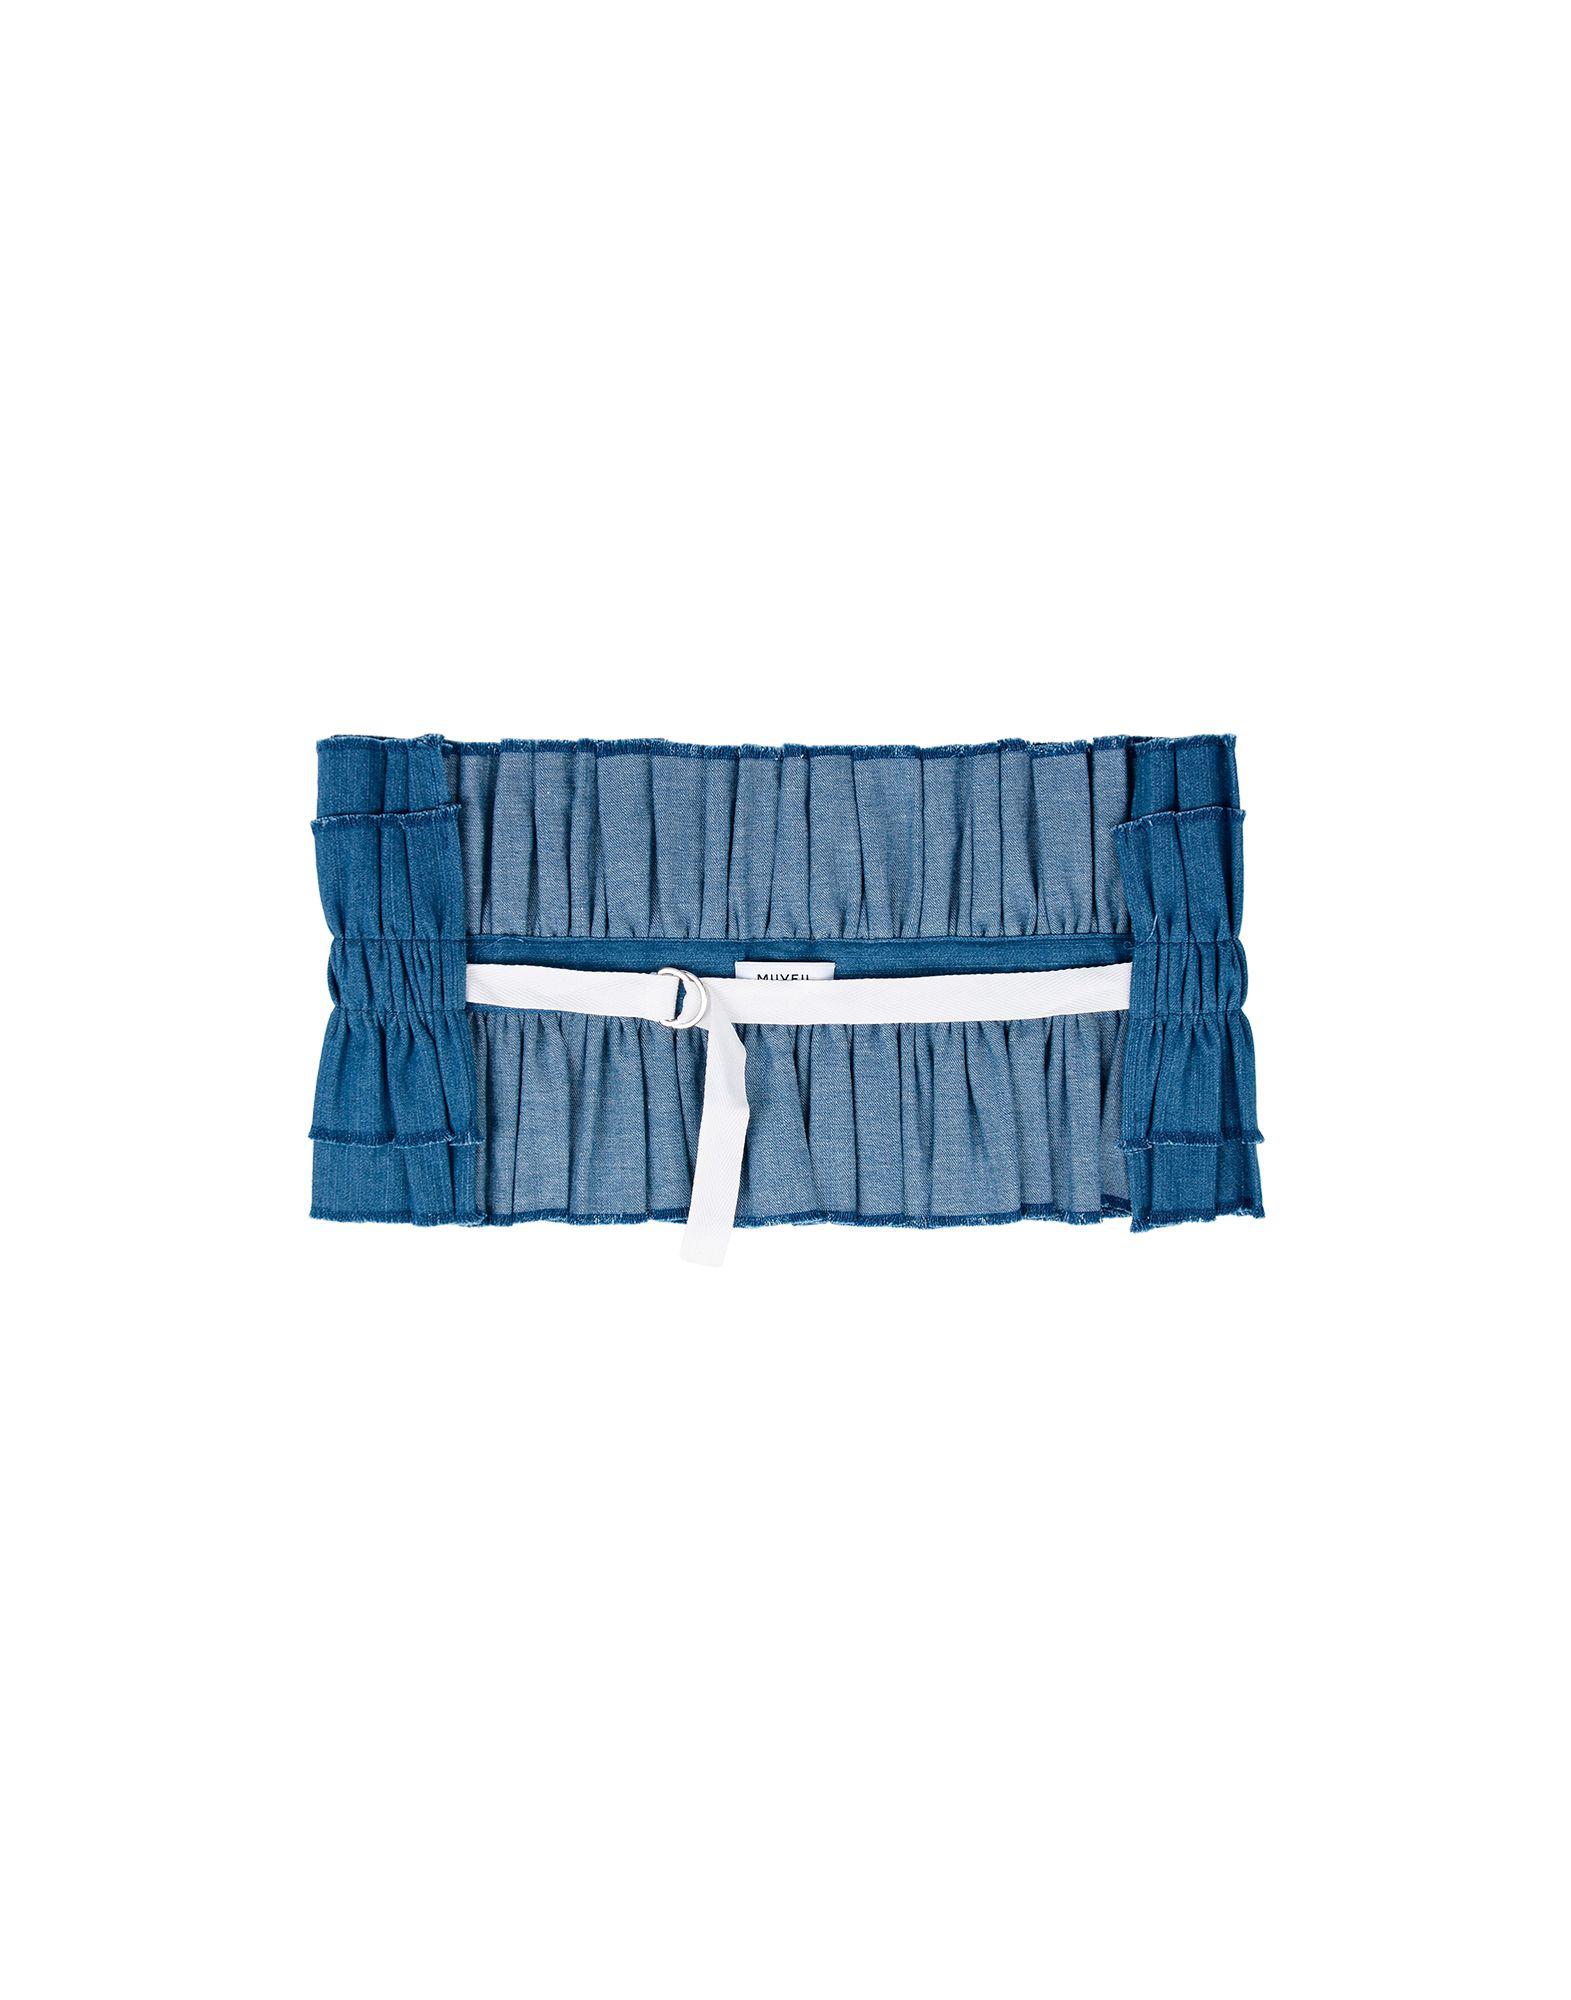 Muveil Belt In Blue